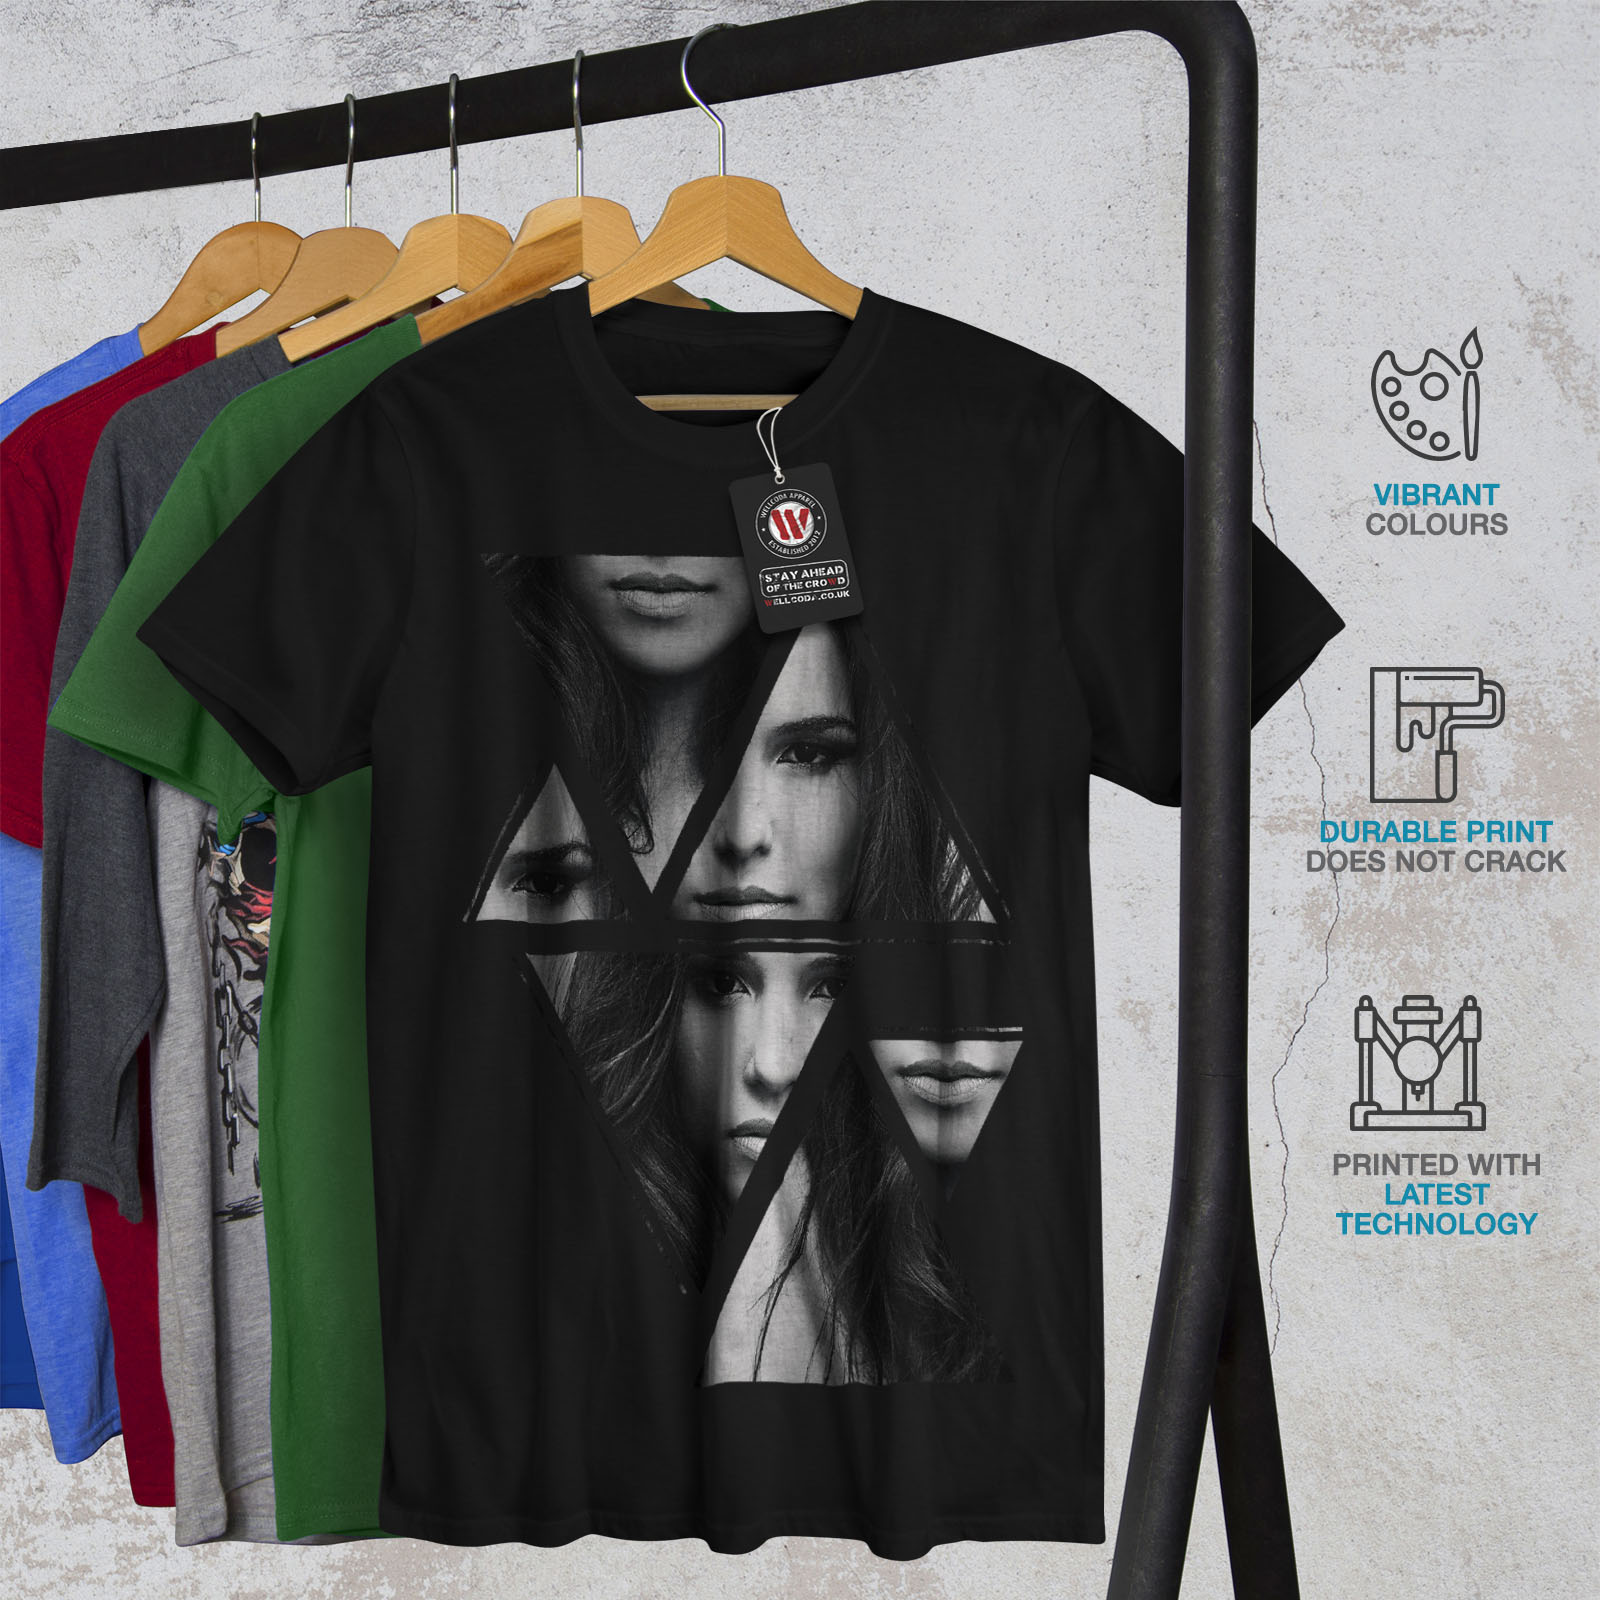 Wellcoda-Art-Fashion-Face-T-shirt-homme-Abstract-Design-graphique-imprime-Tee miniature 6